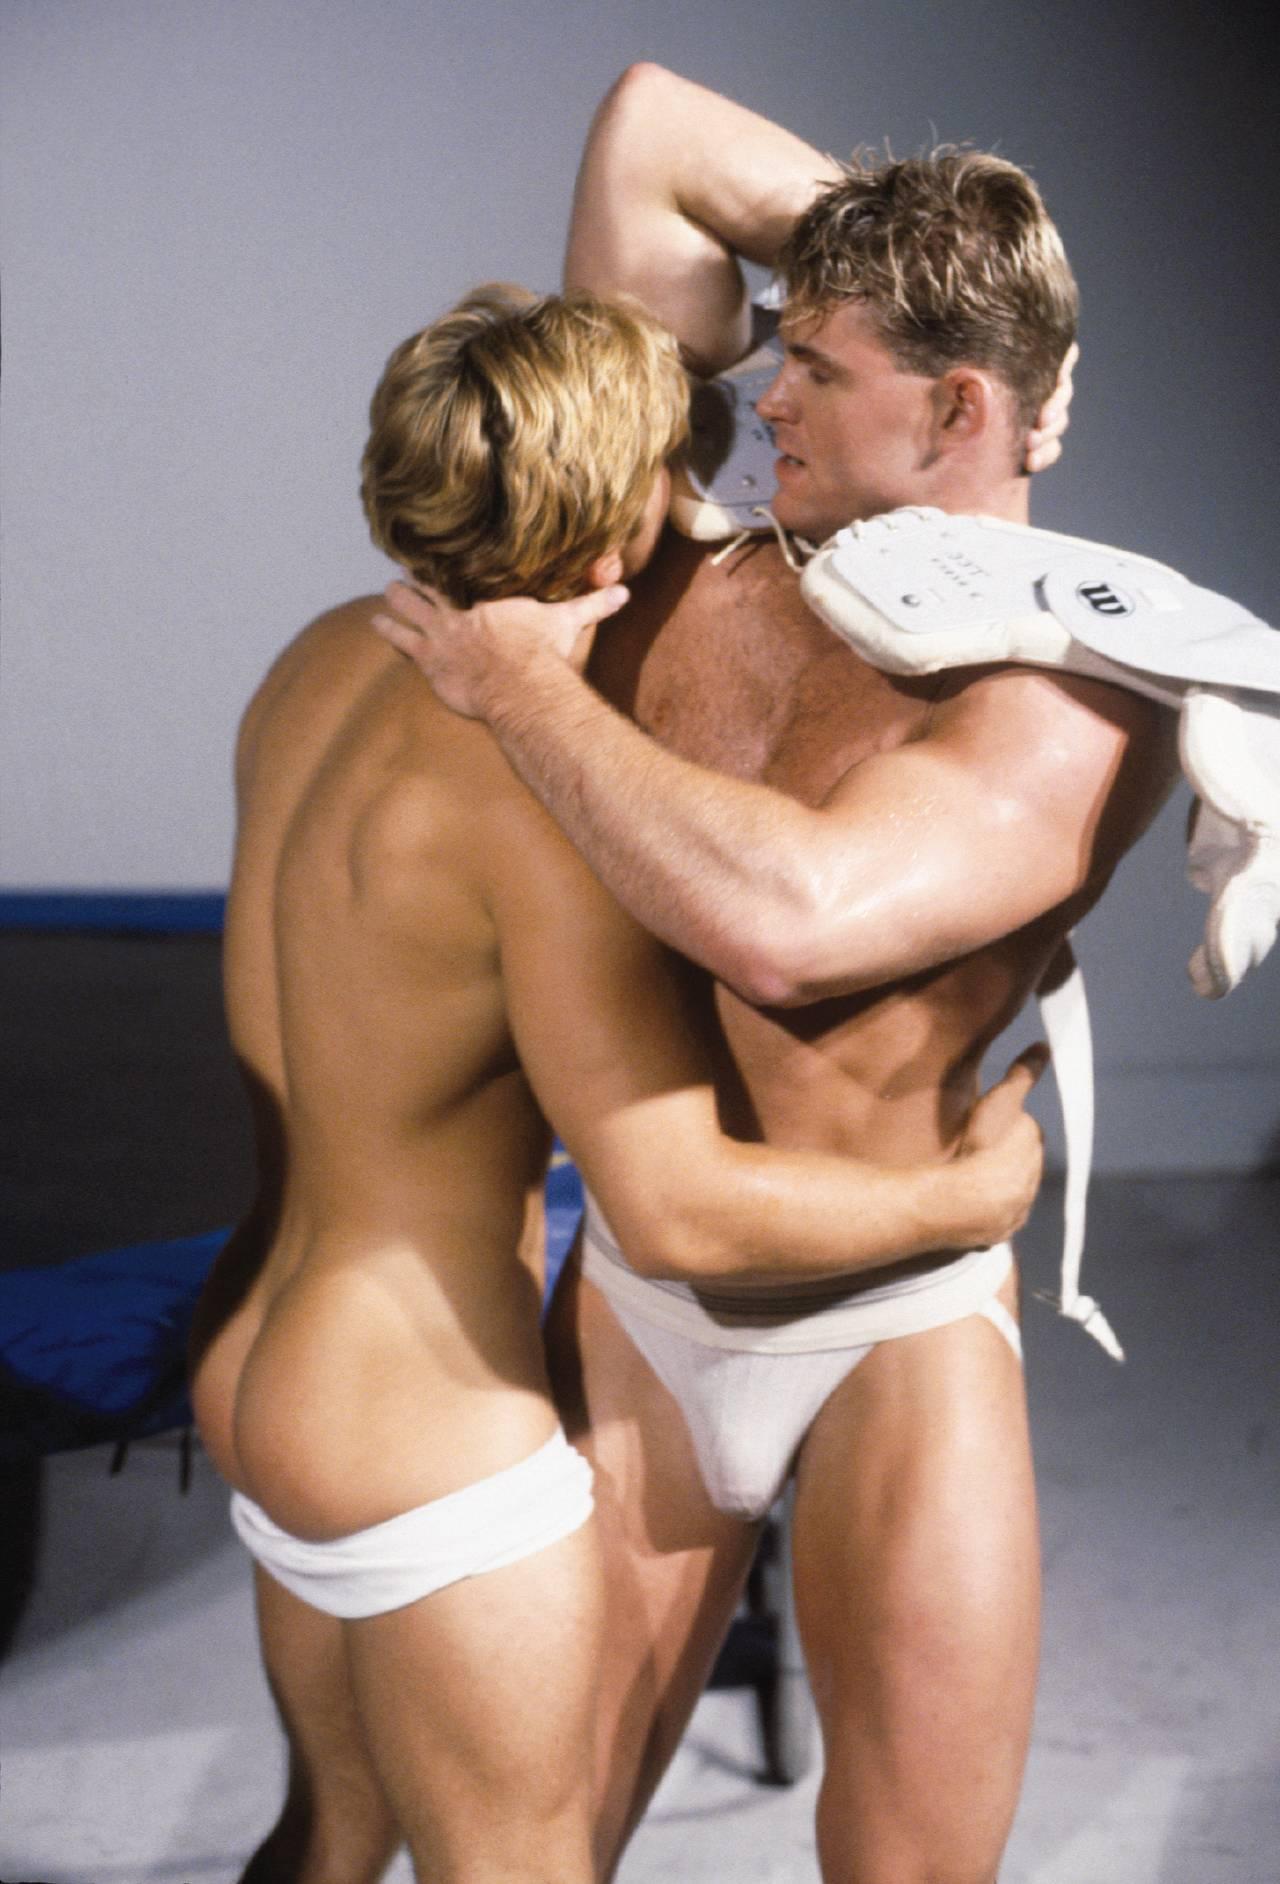 Ken Ryker Alec Powers David Logan New Pledgemaster gay hot daddy dude men porn